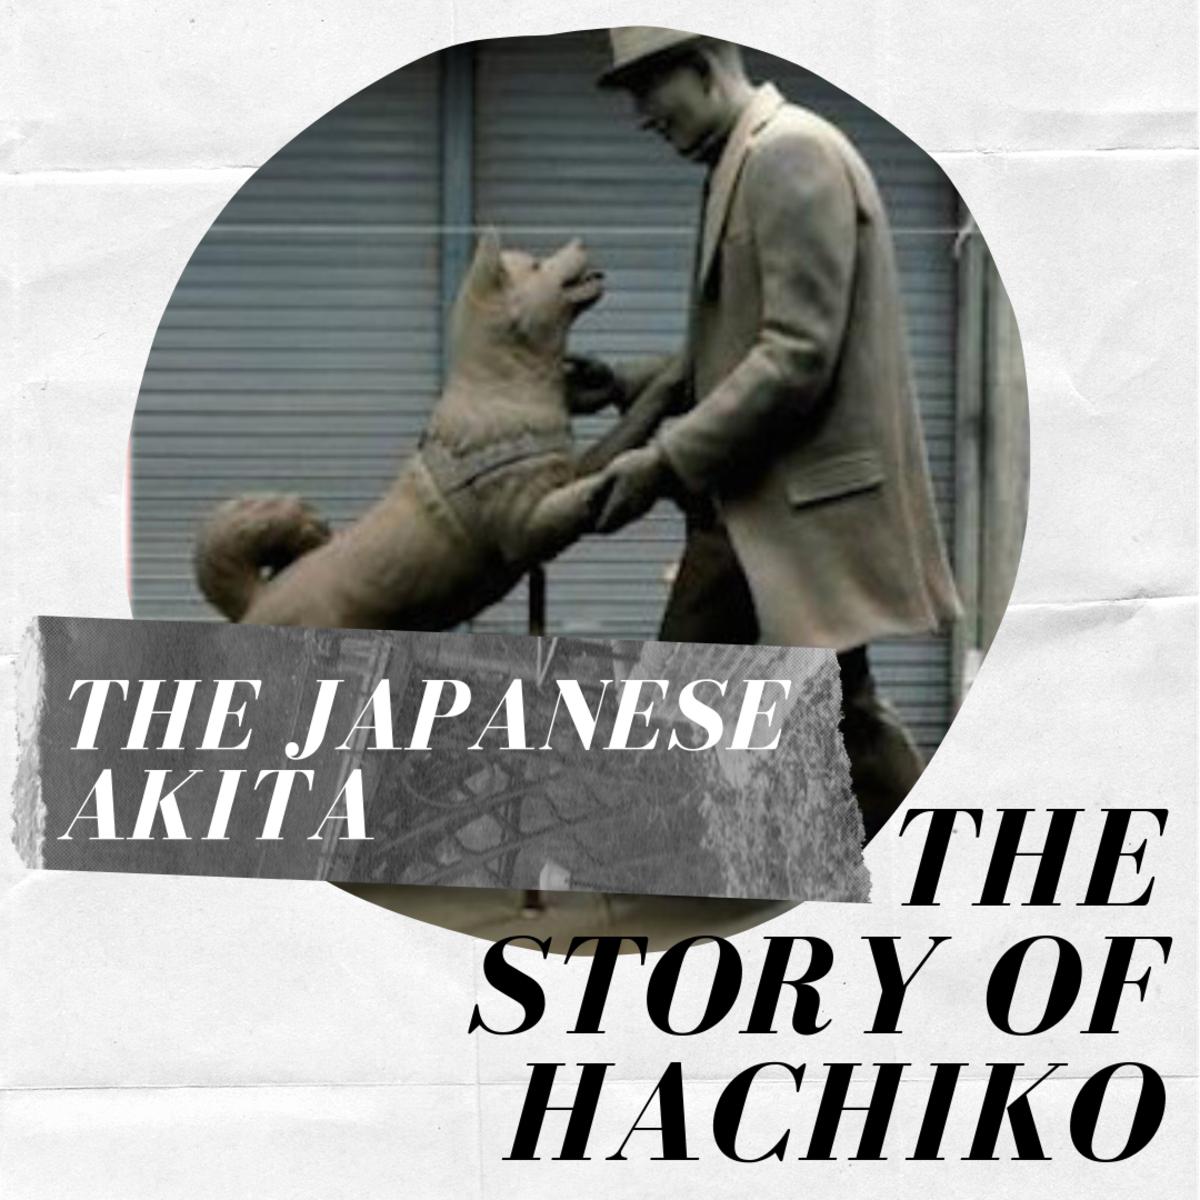 Japanese Akita Inu: The Story of Hachiko, the Loyal Dog